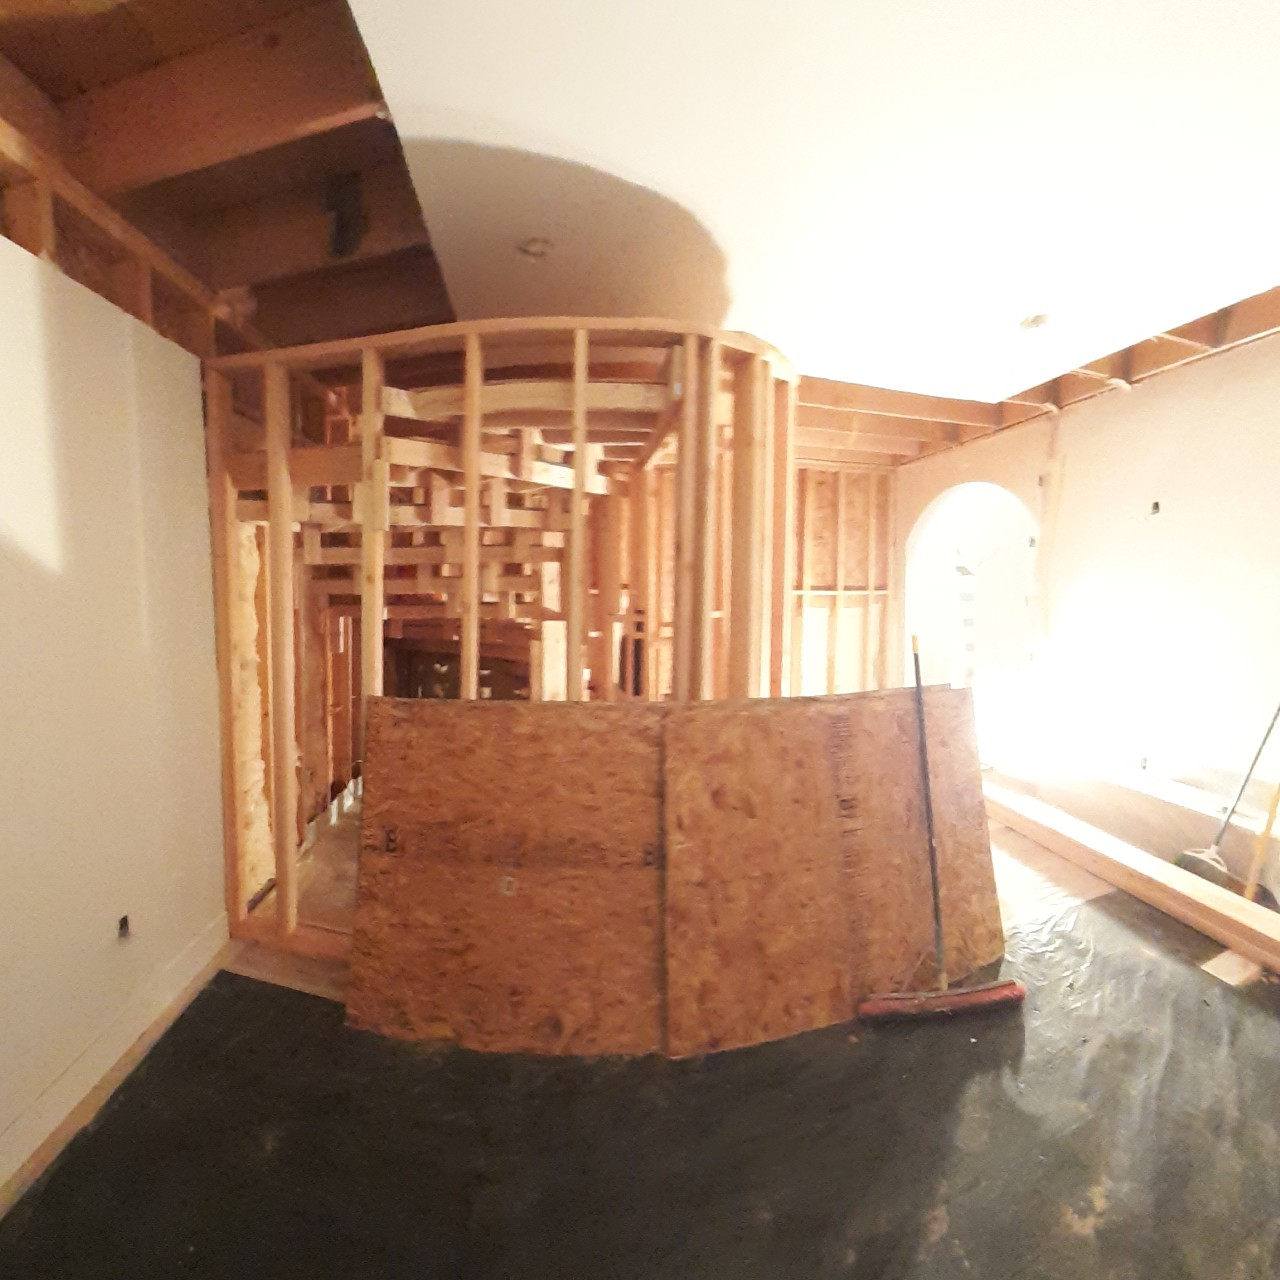 carpentry-wood-framing-second-floor-home-addition--framing-41